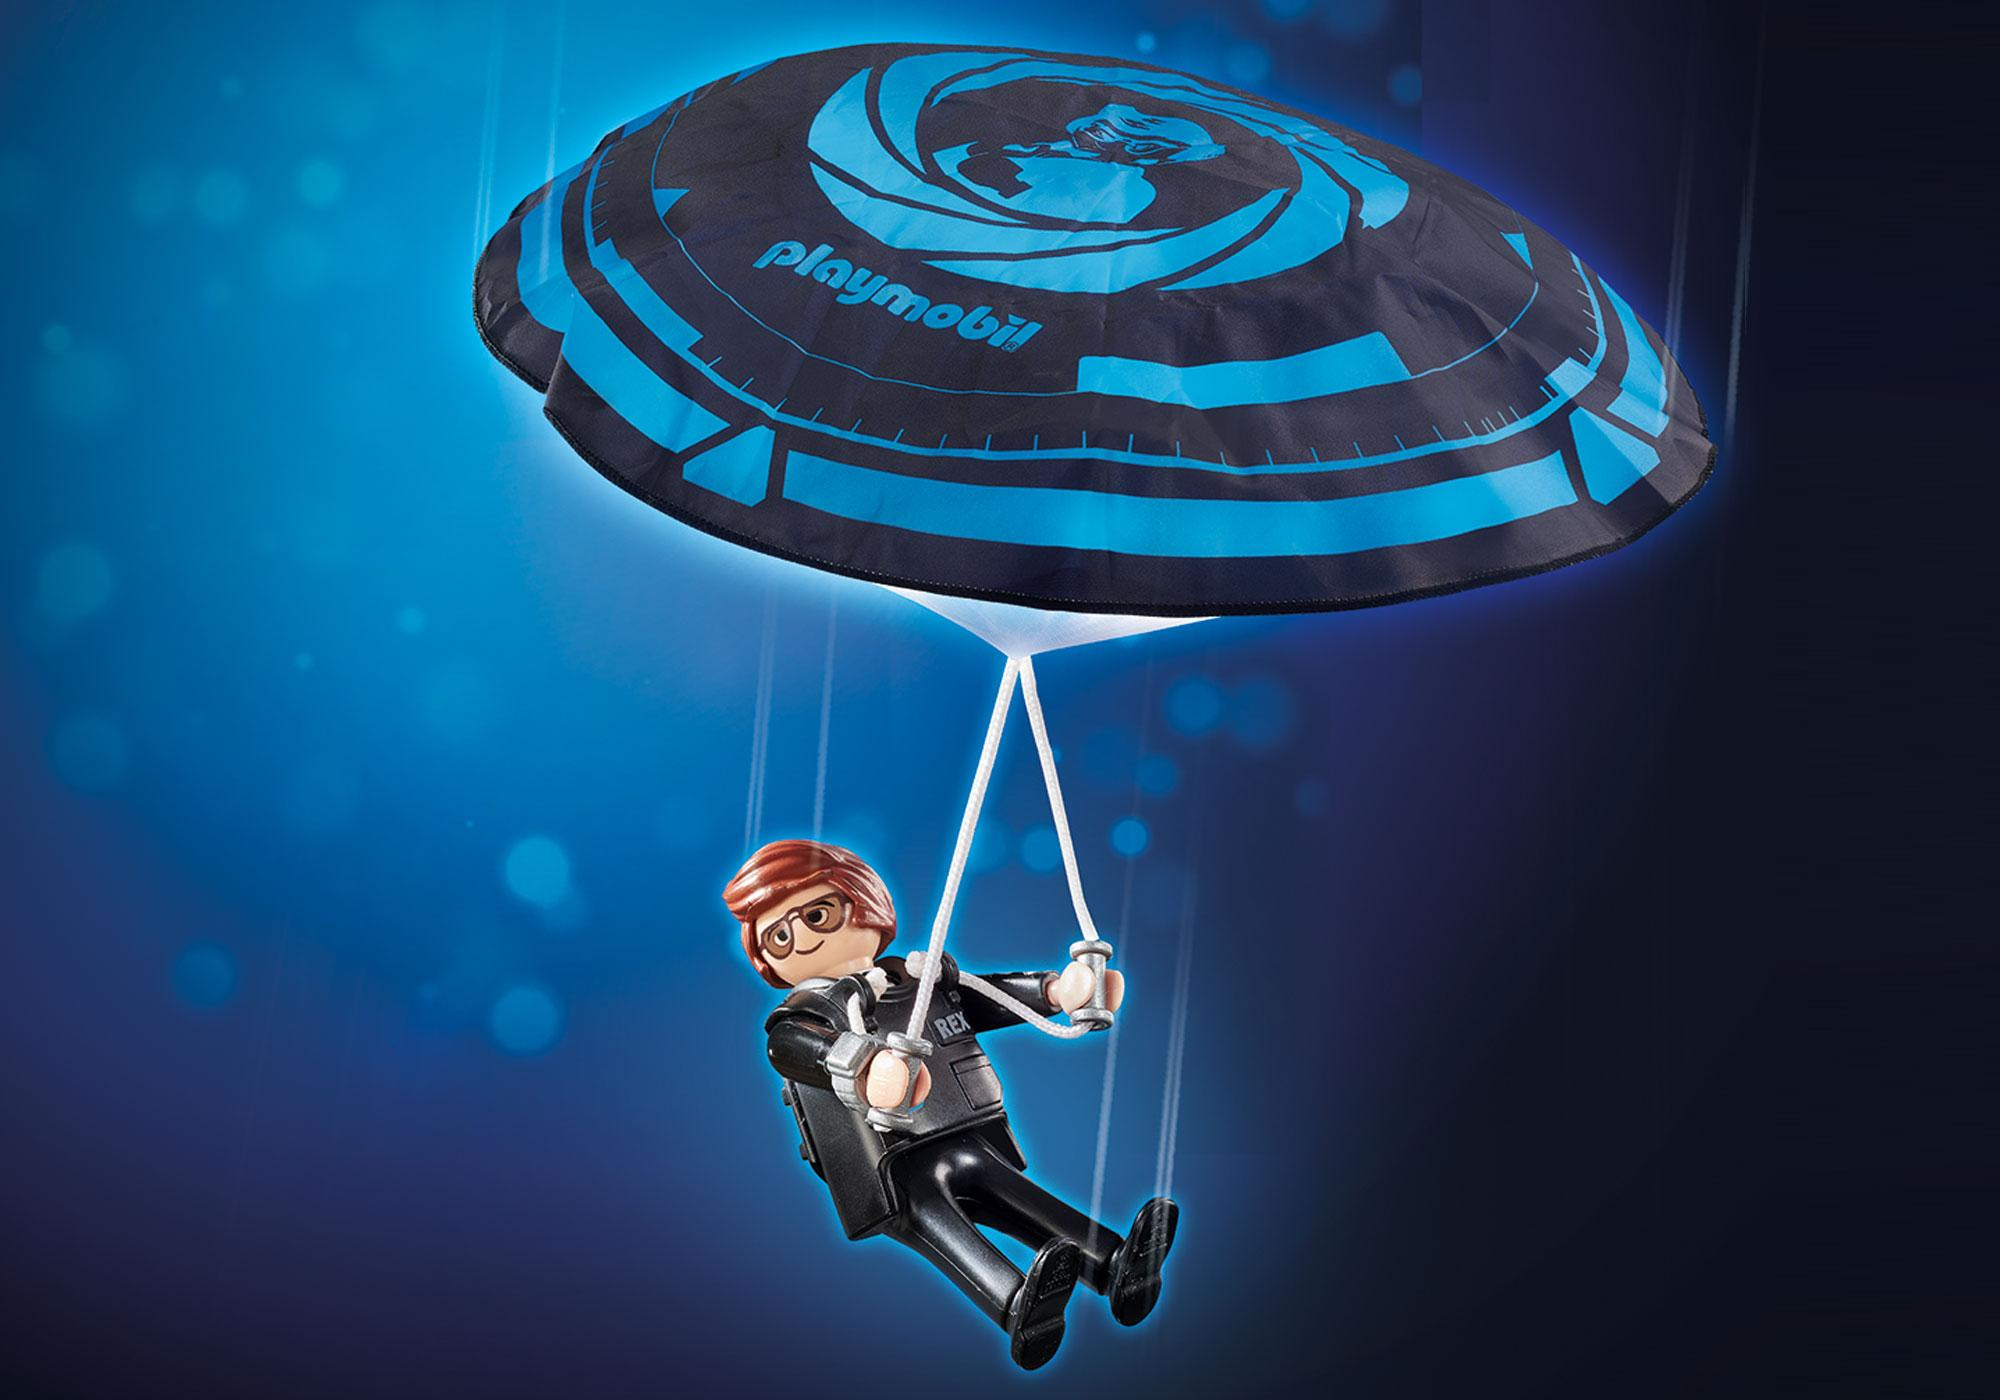 70070_product_detail/PLAYMOBIL: THE MOVIE Rex Dasher met parachute